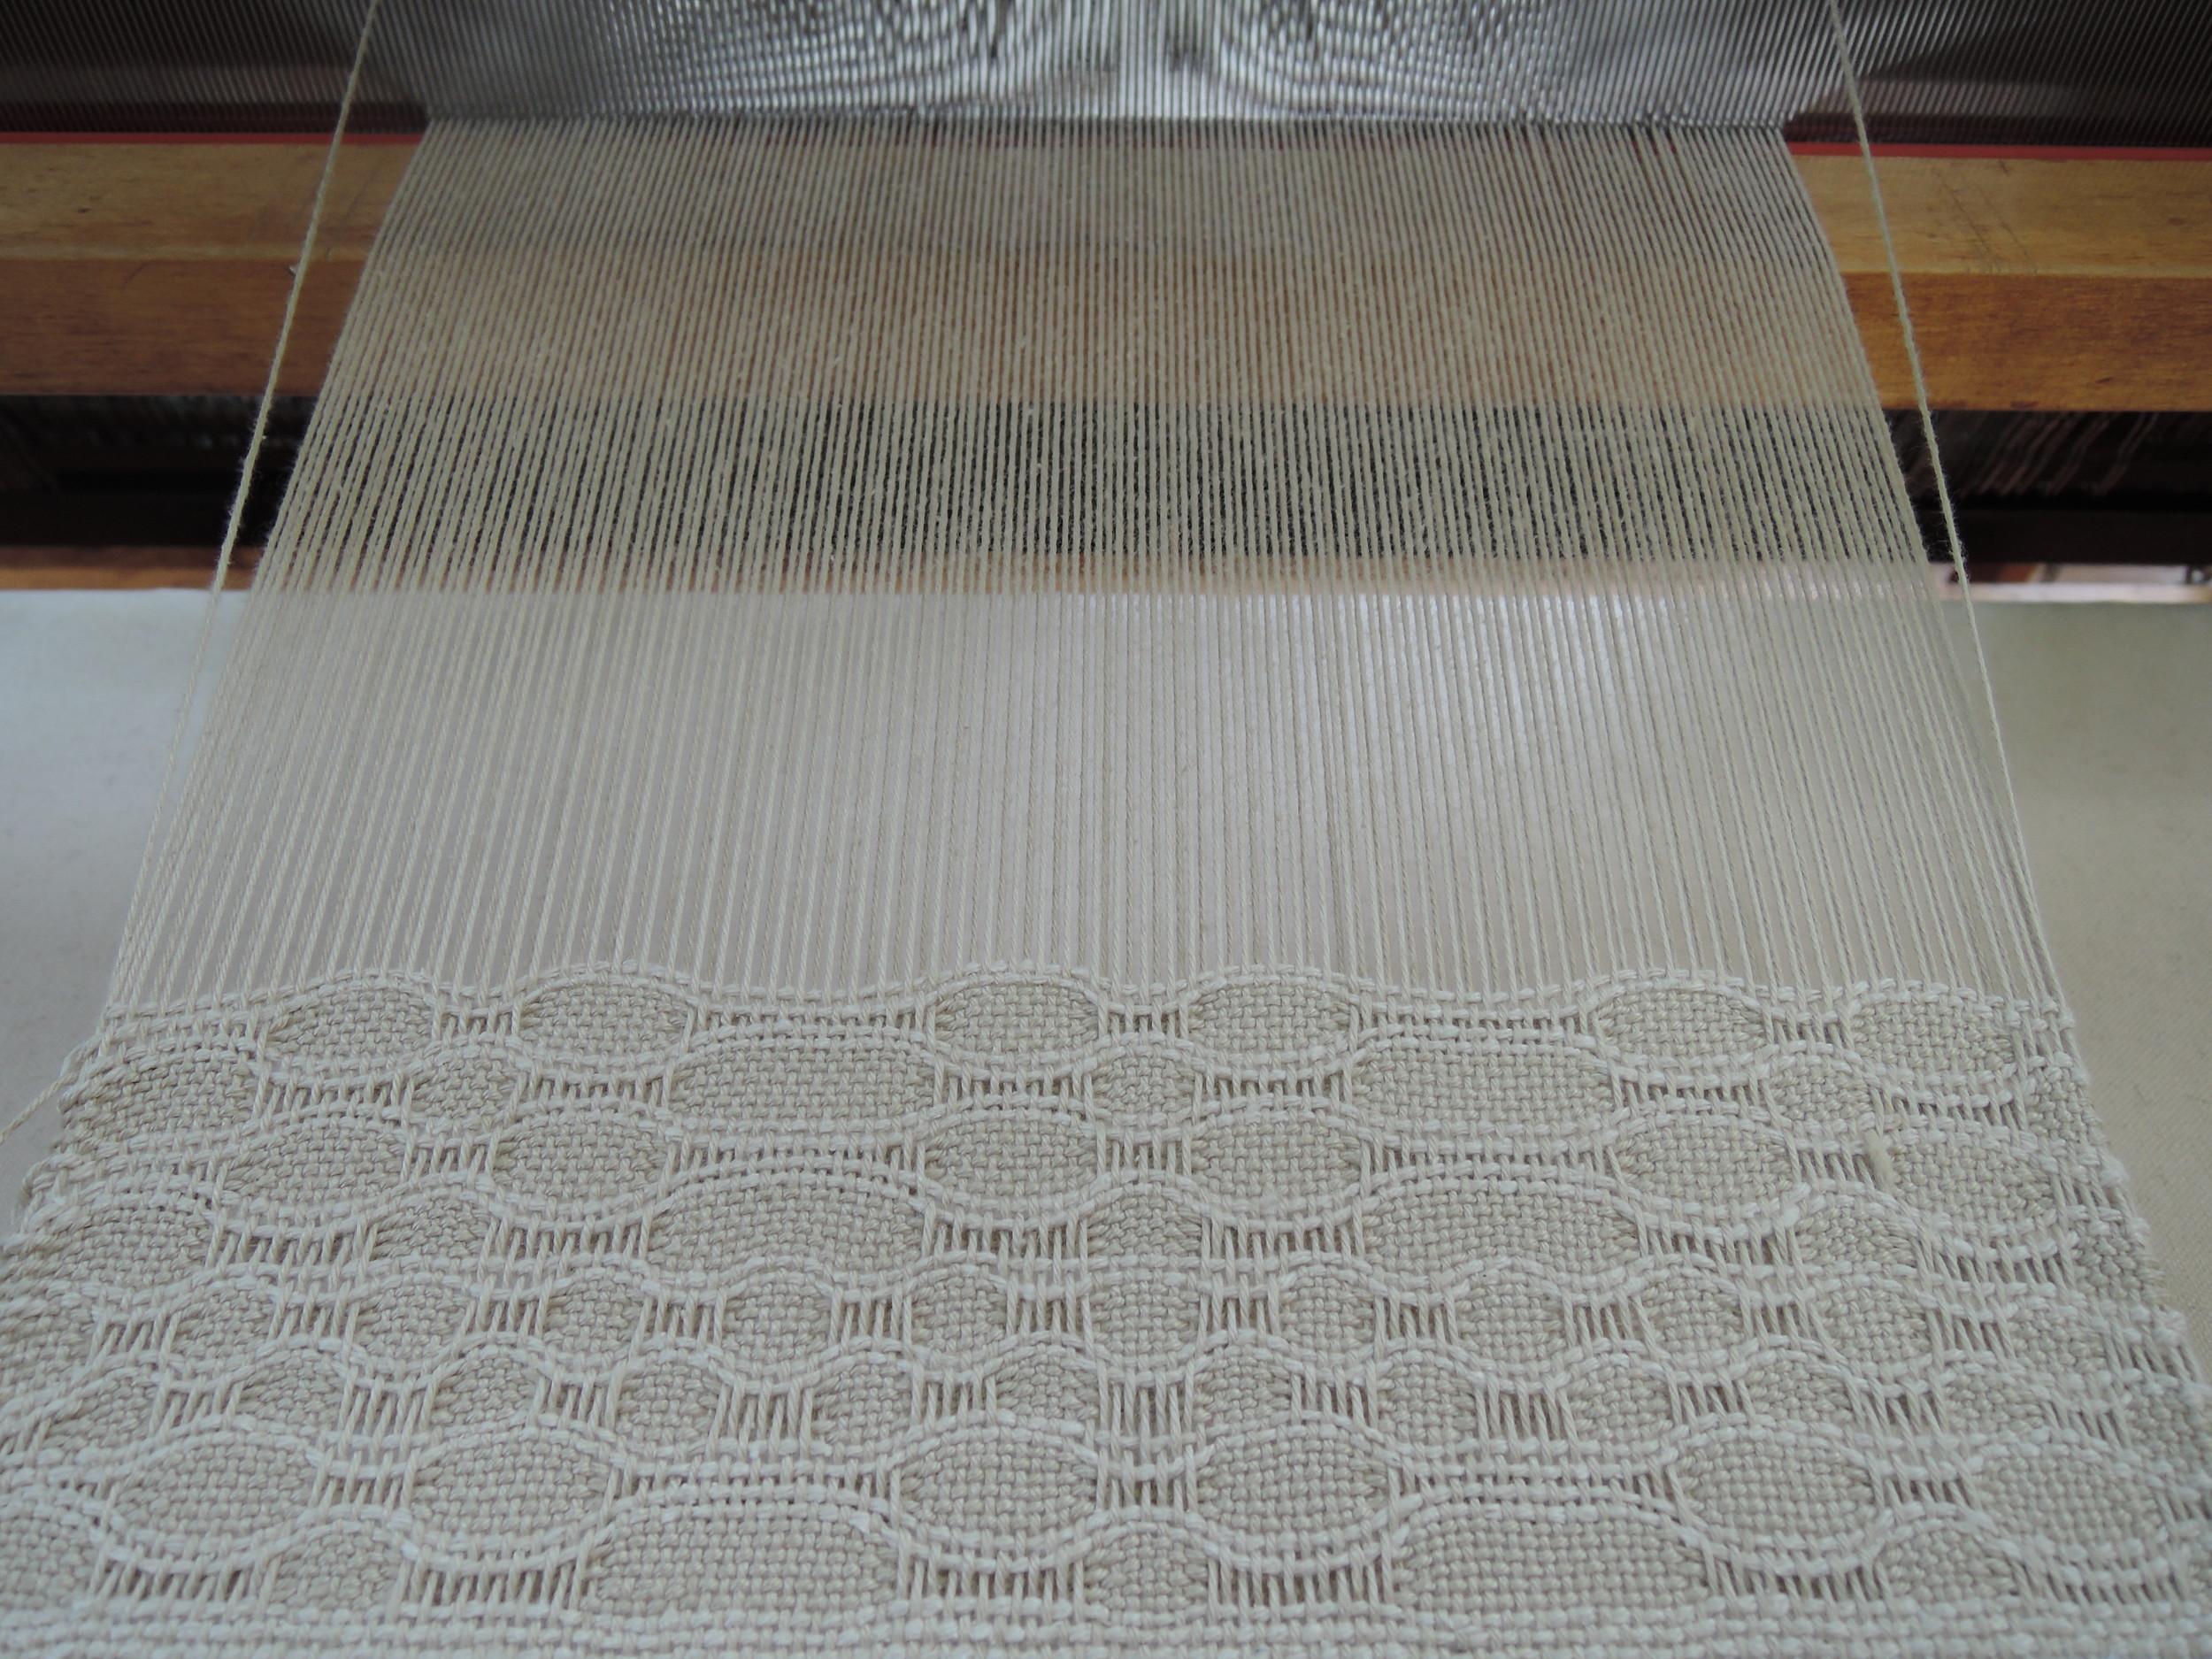 Let the weaving begin!